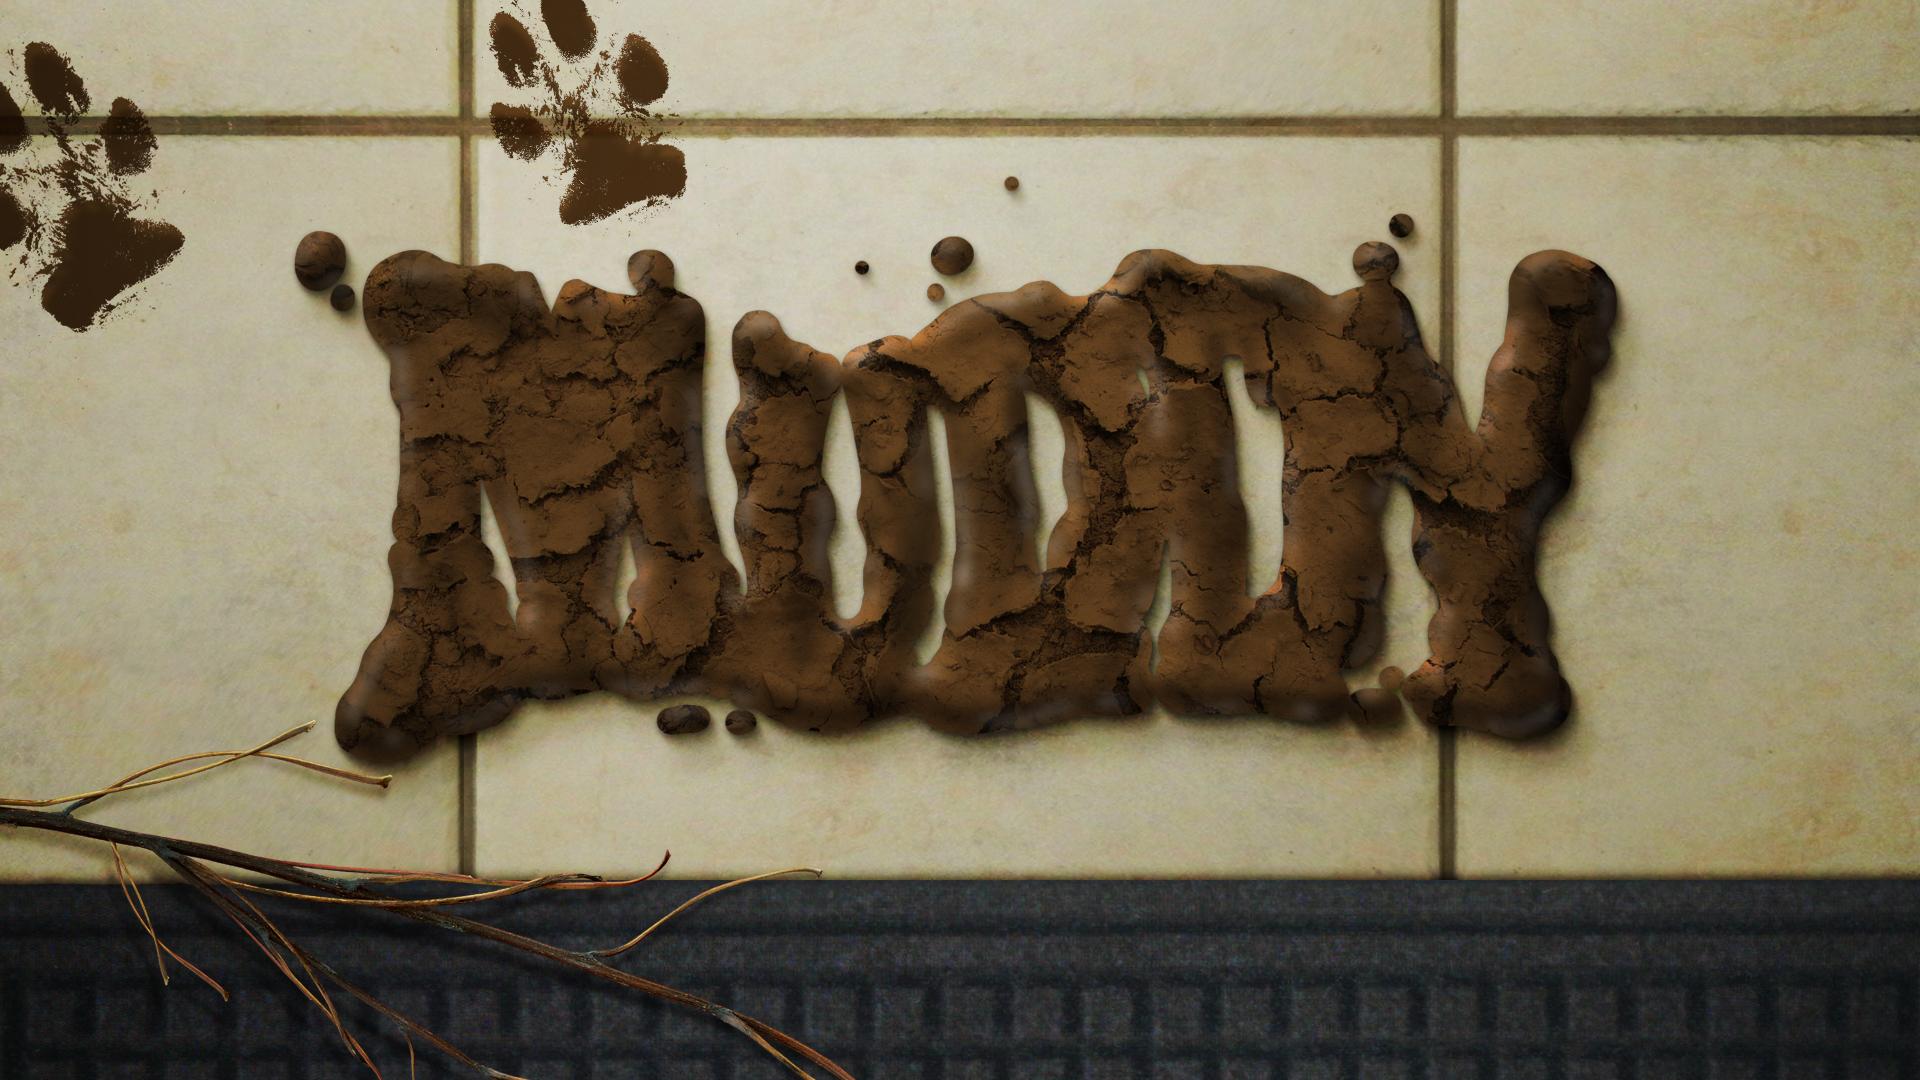 Clorox_muddy_01.jpg